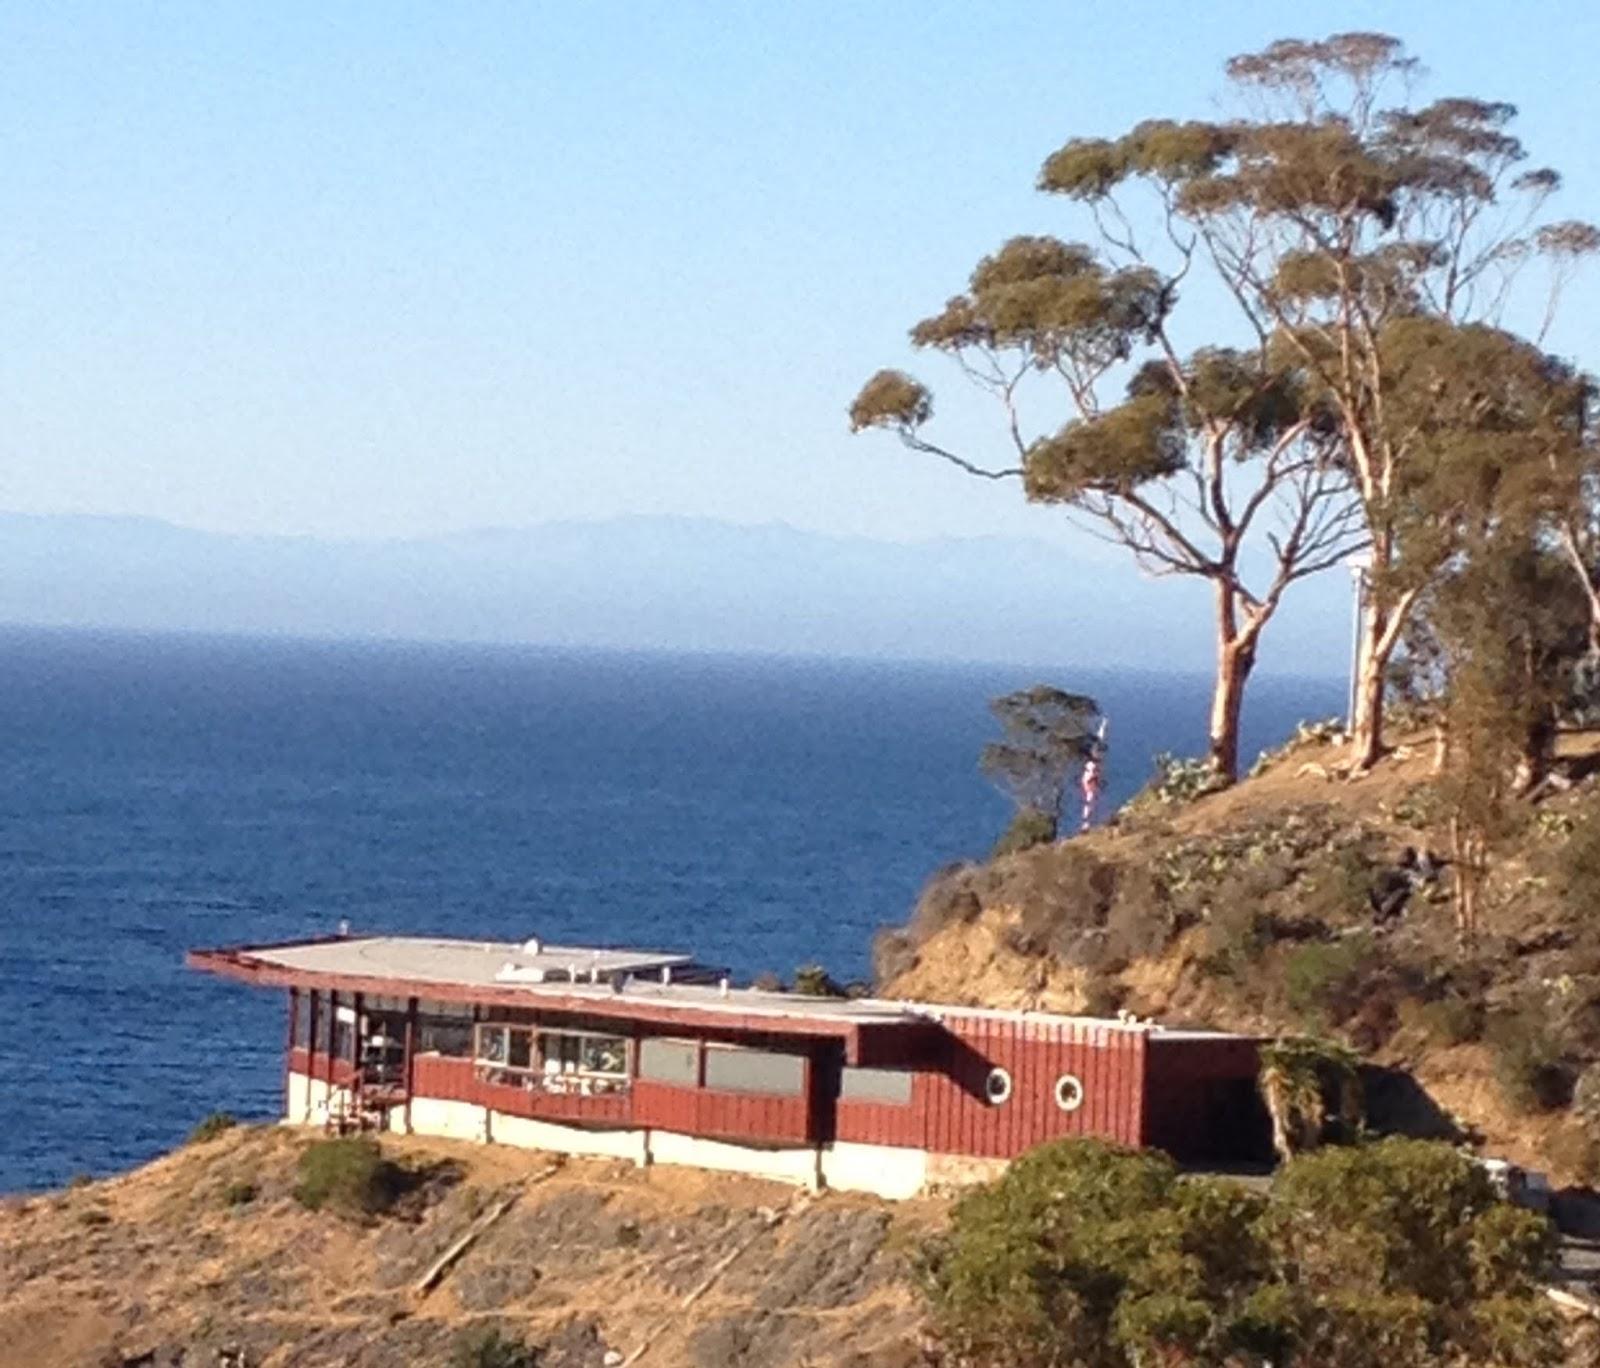 Santa Catalina Island, California, midcentury modern